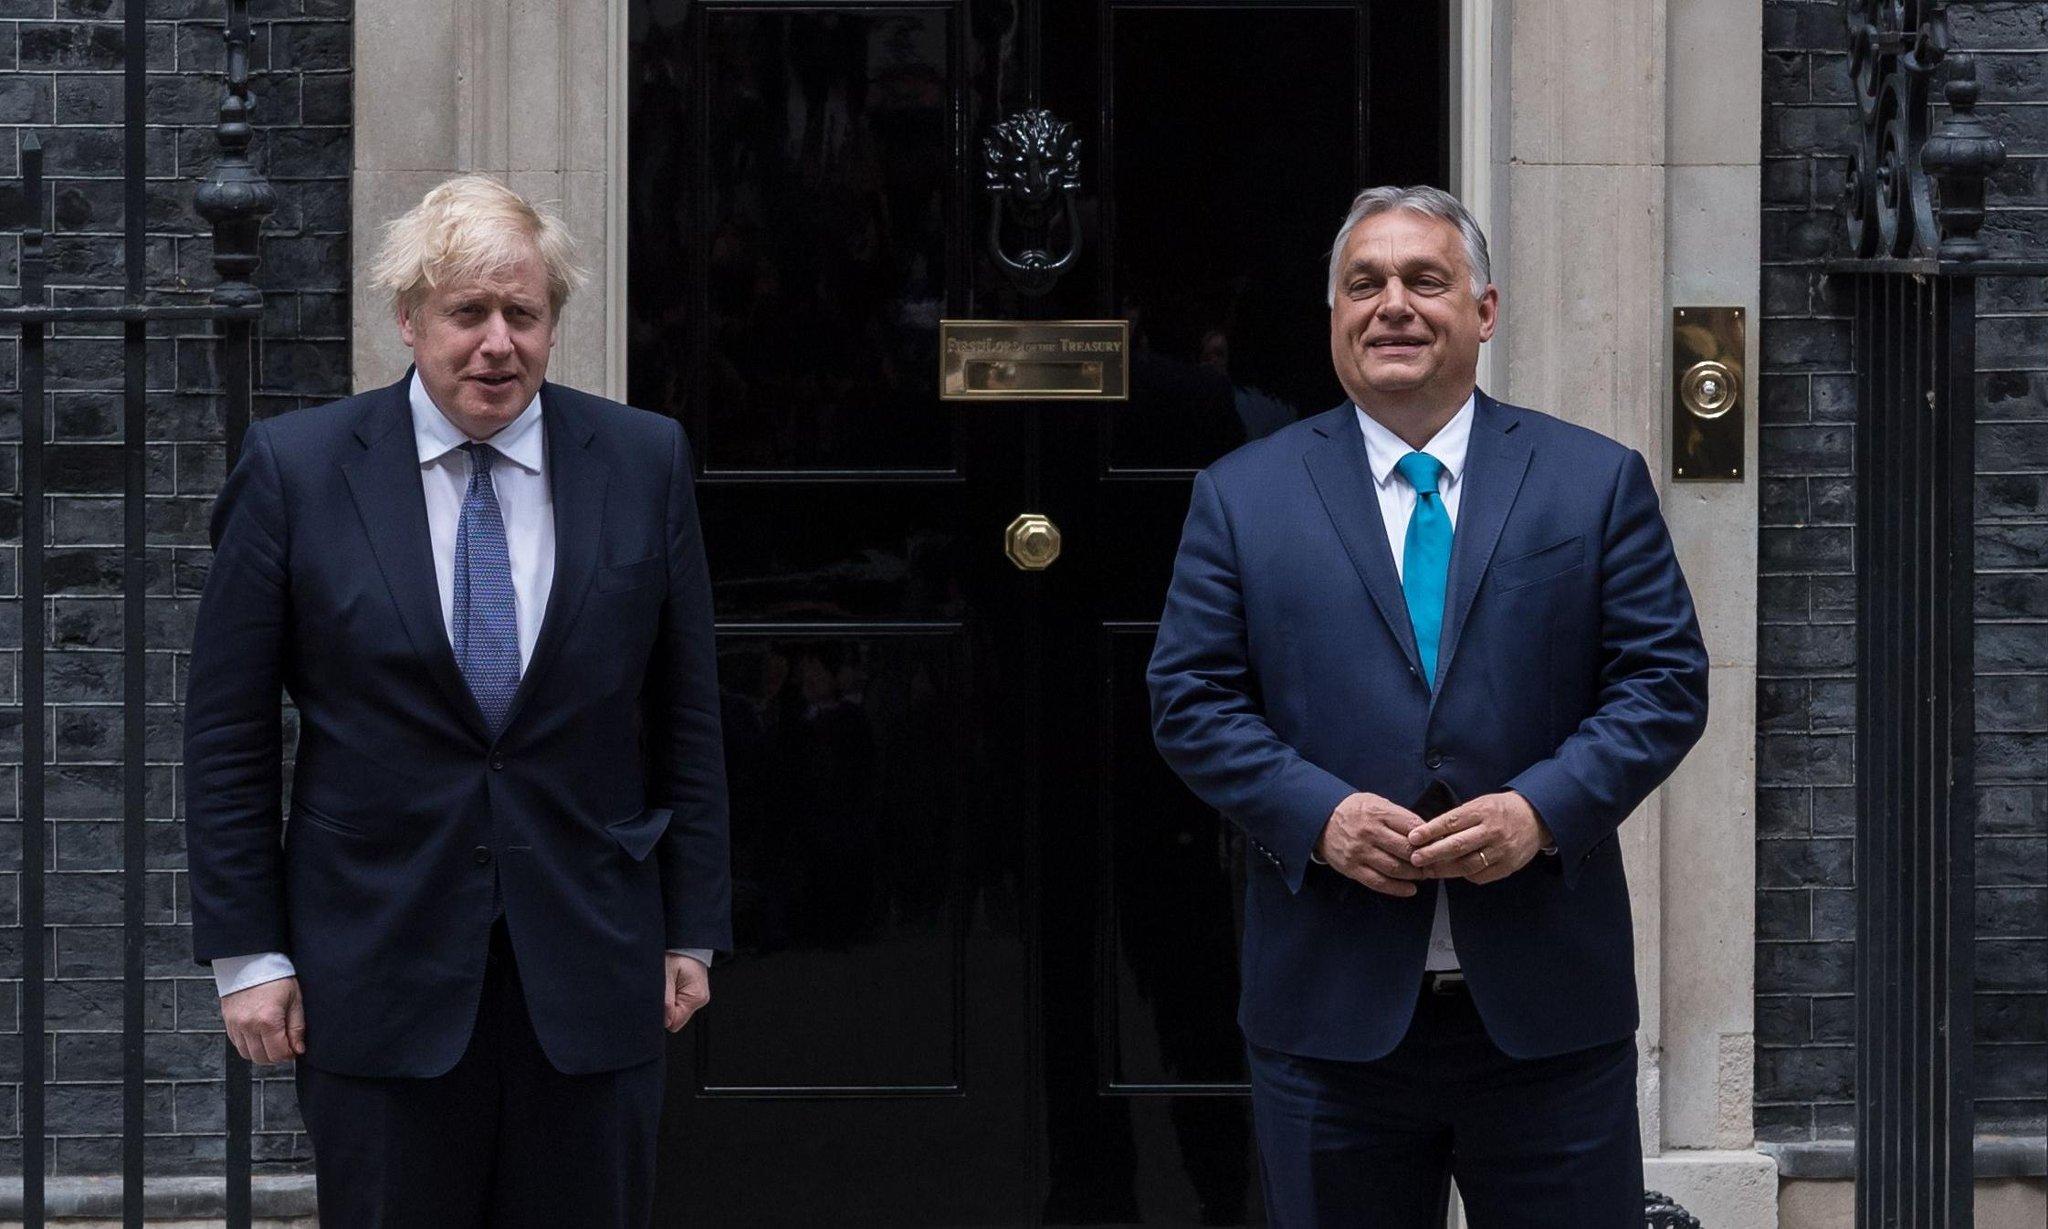 Orban and Johnson